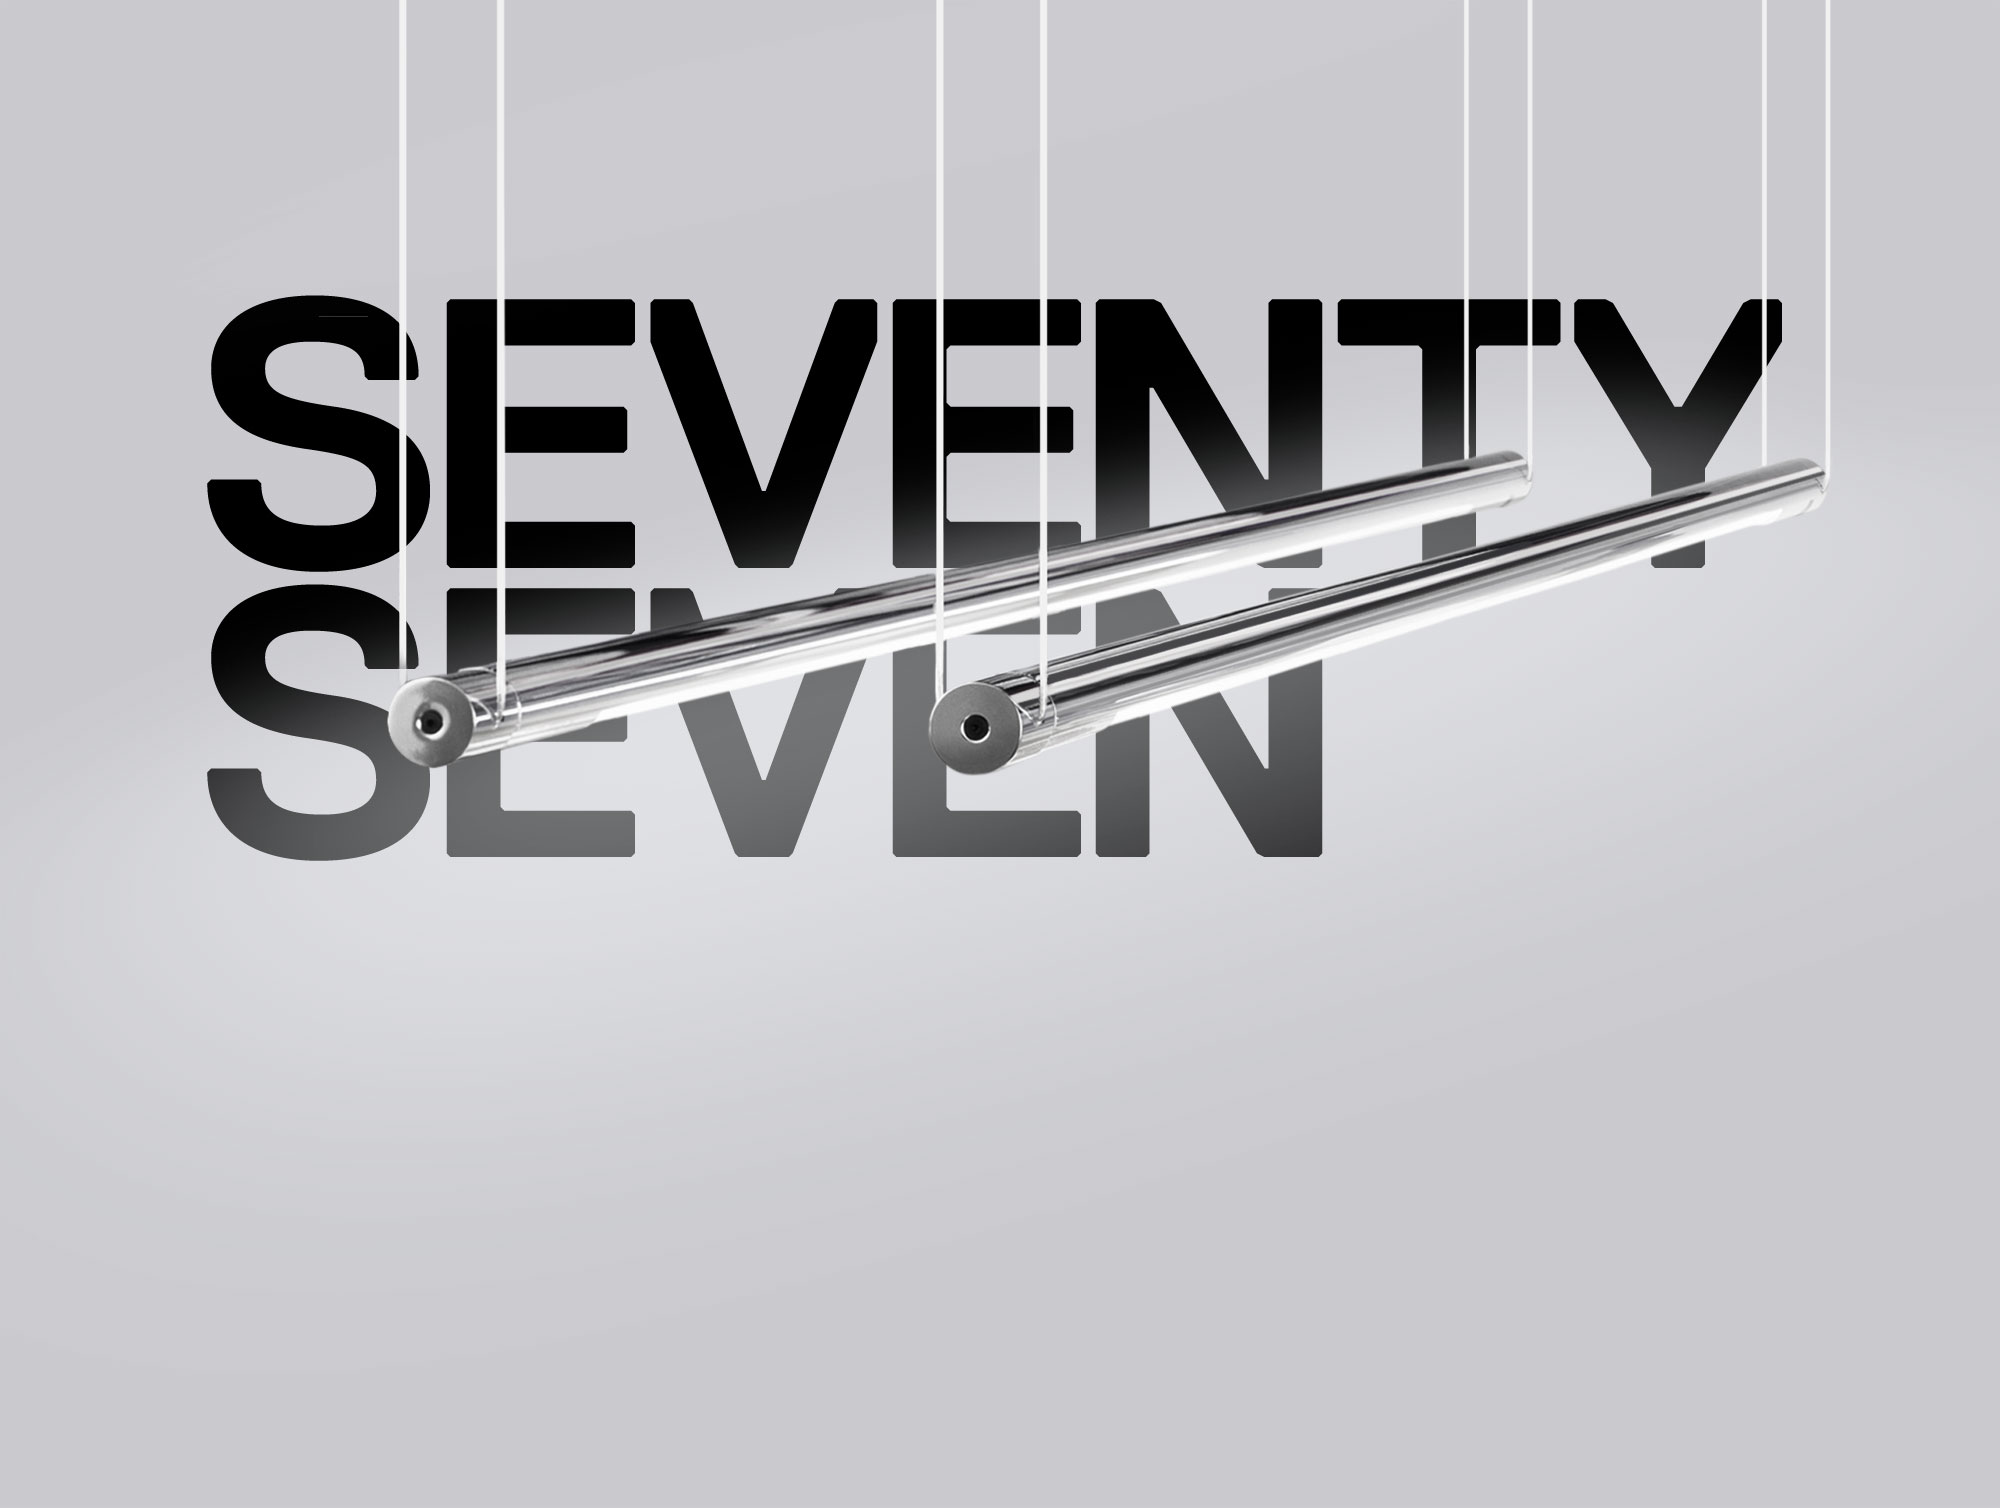 Seventhyseven